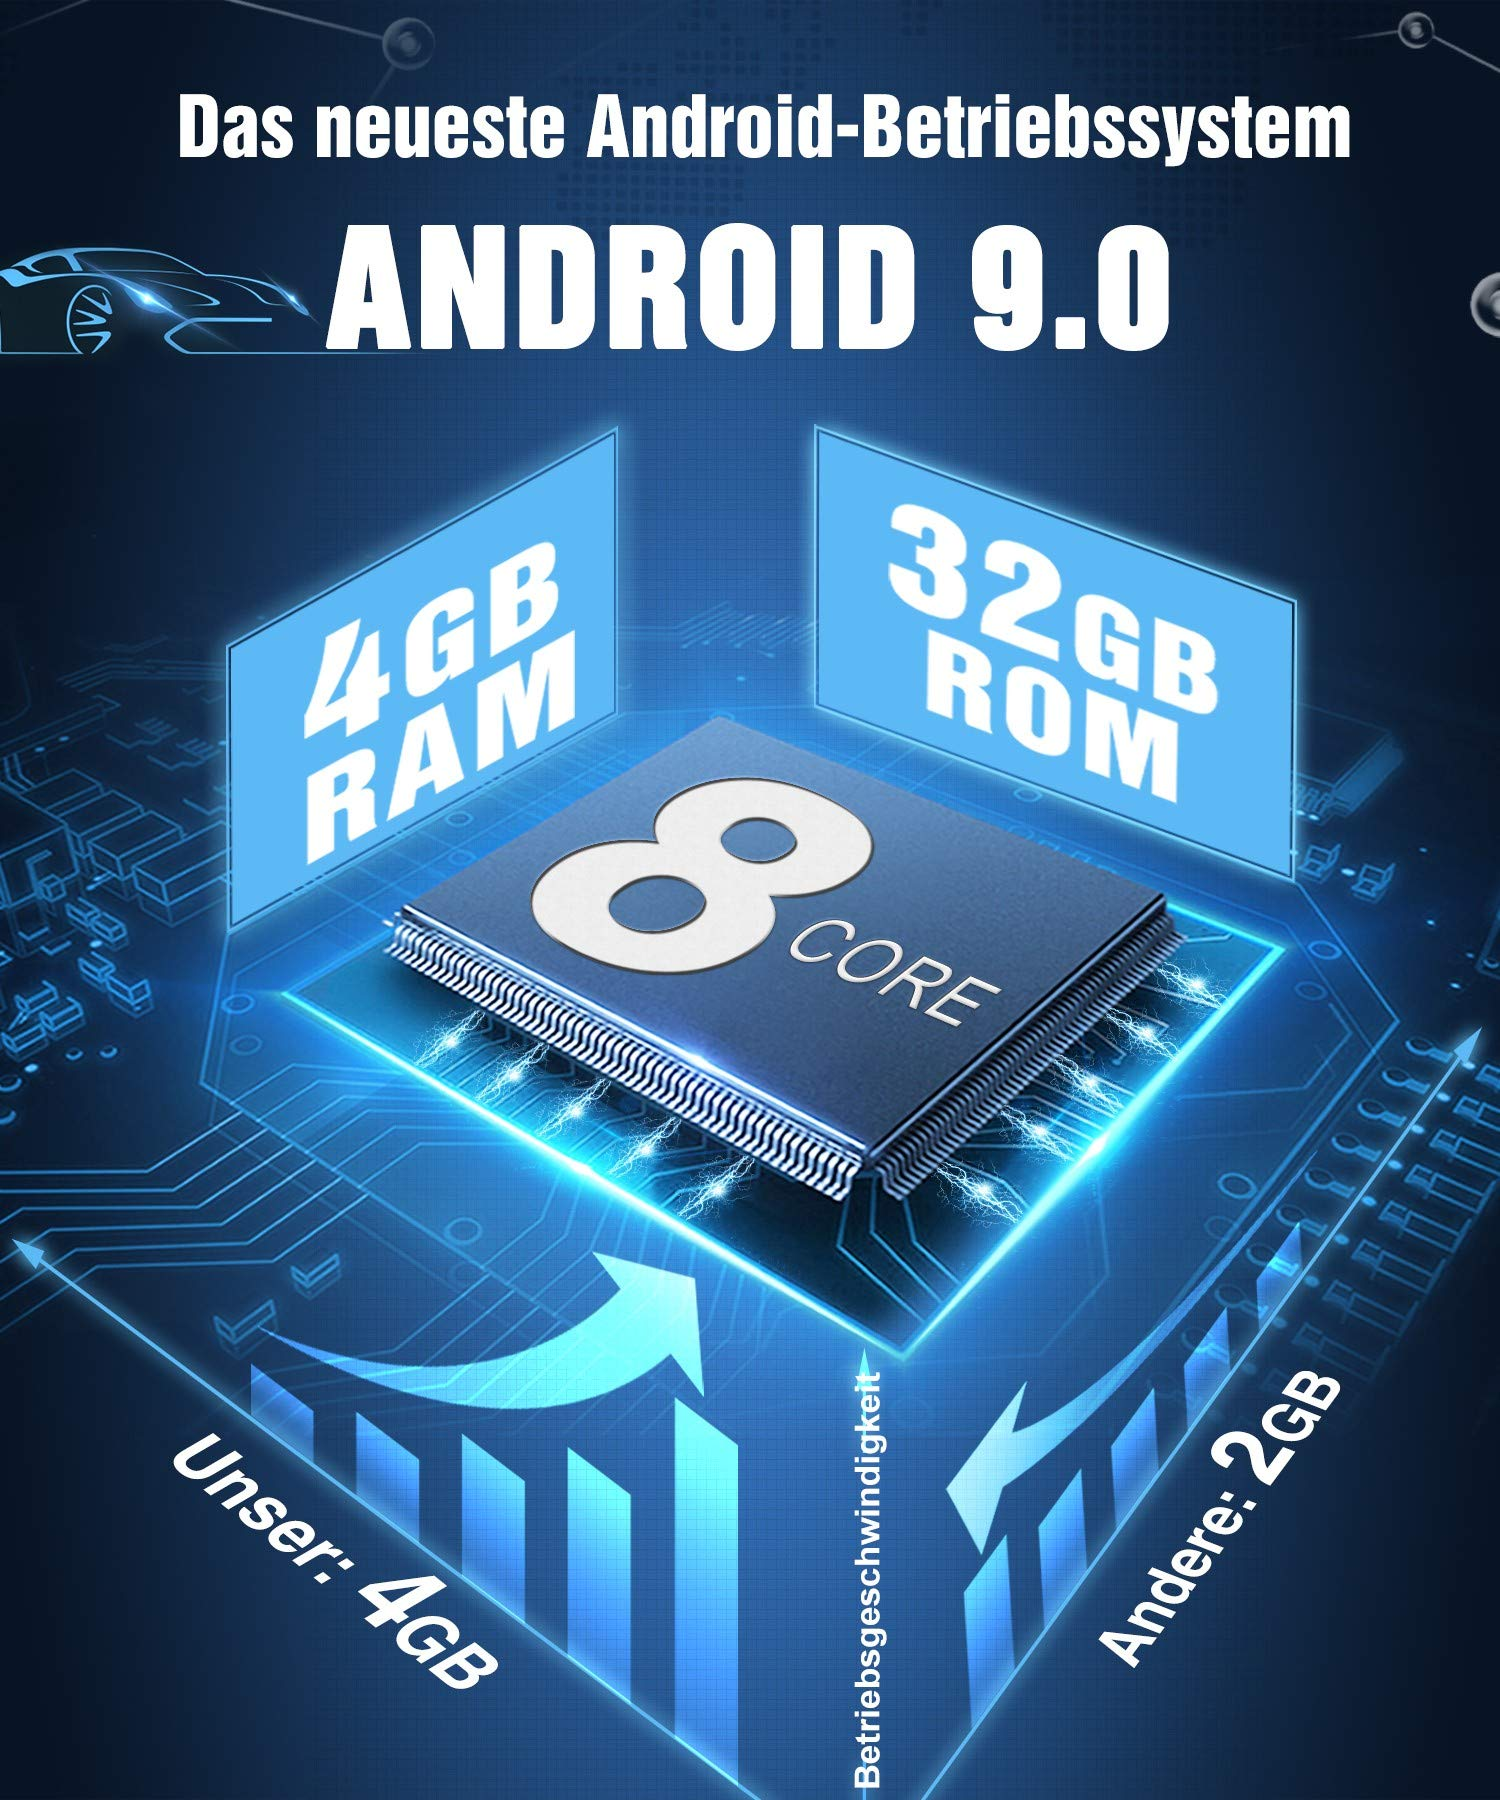 PUMPKIN-Android-90-Autoradio-fr-VW-Radio-mit-Navi-4GB-32GB-Untersttzt-Bluetooth-DAB-CD-DVD-WLAN-4G-Android-Auto-USB-MicroSD-Doppel-Din-8-Zoll-Bildschrim